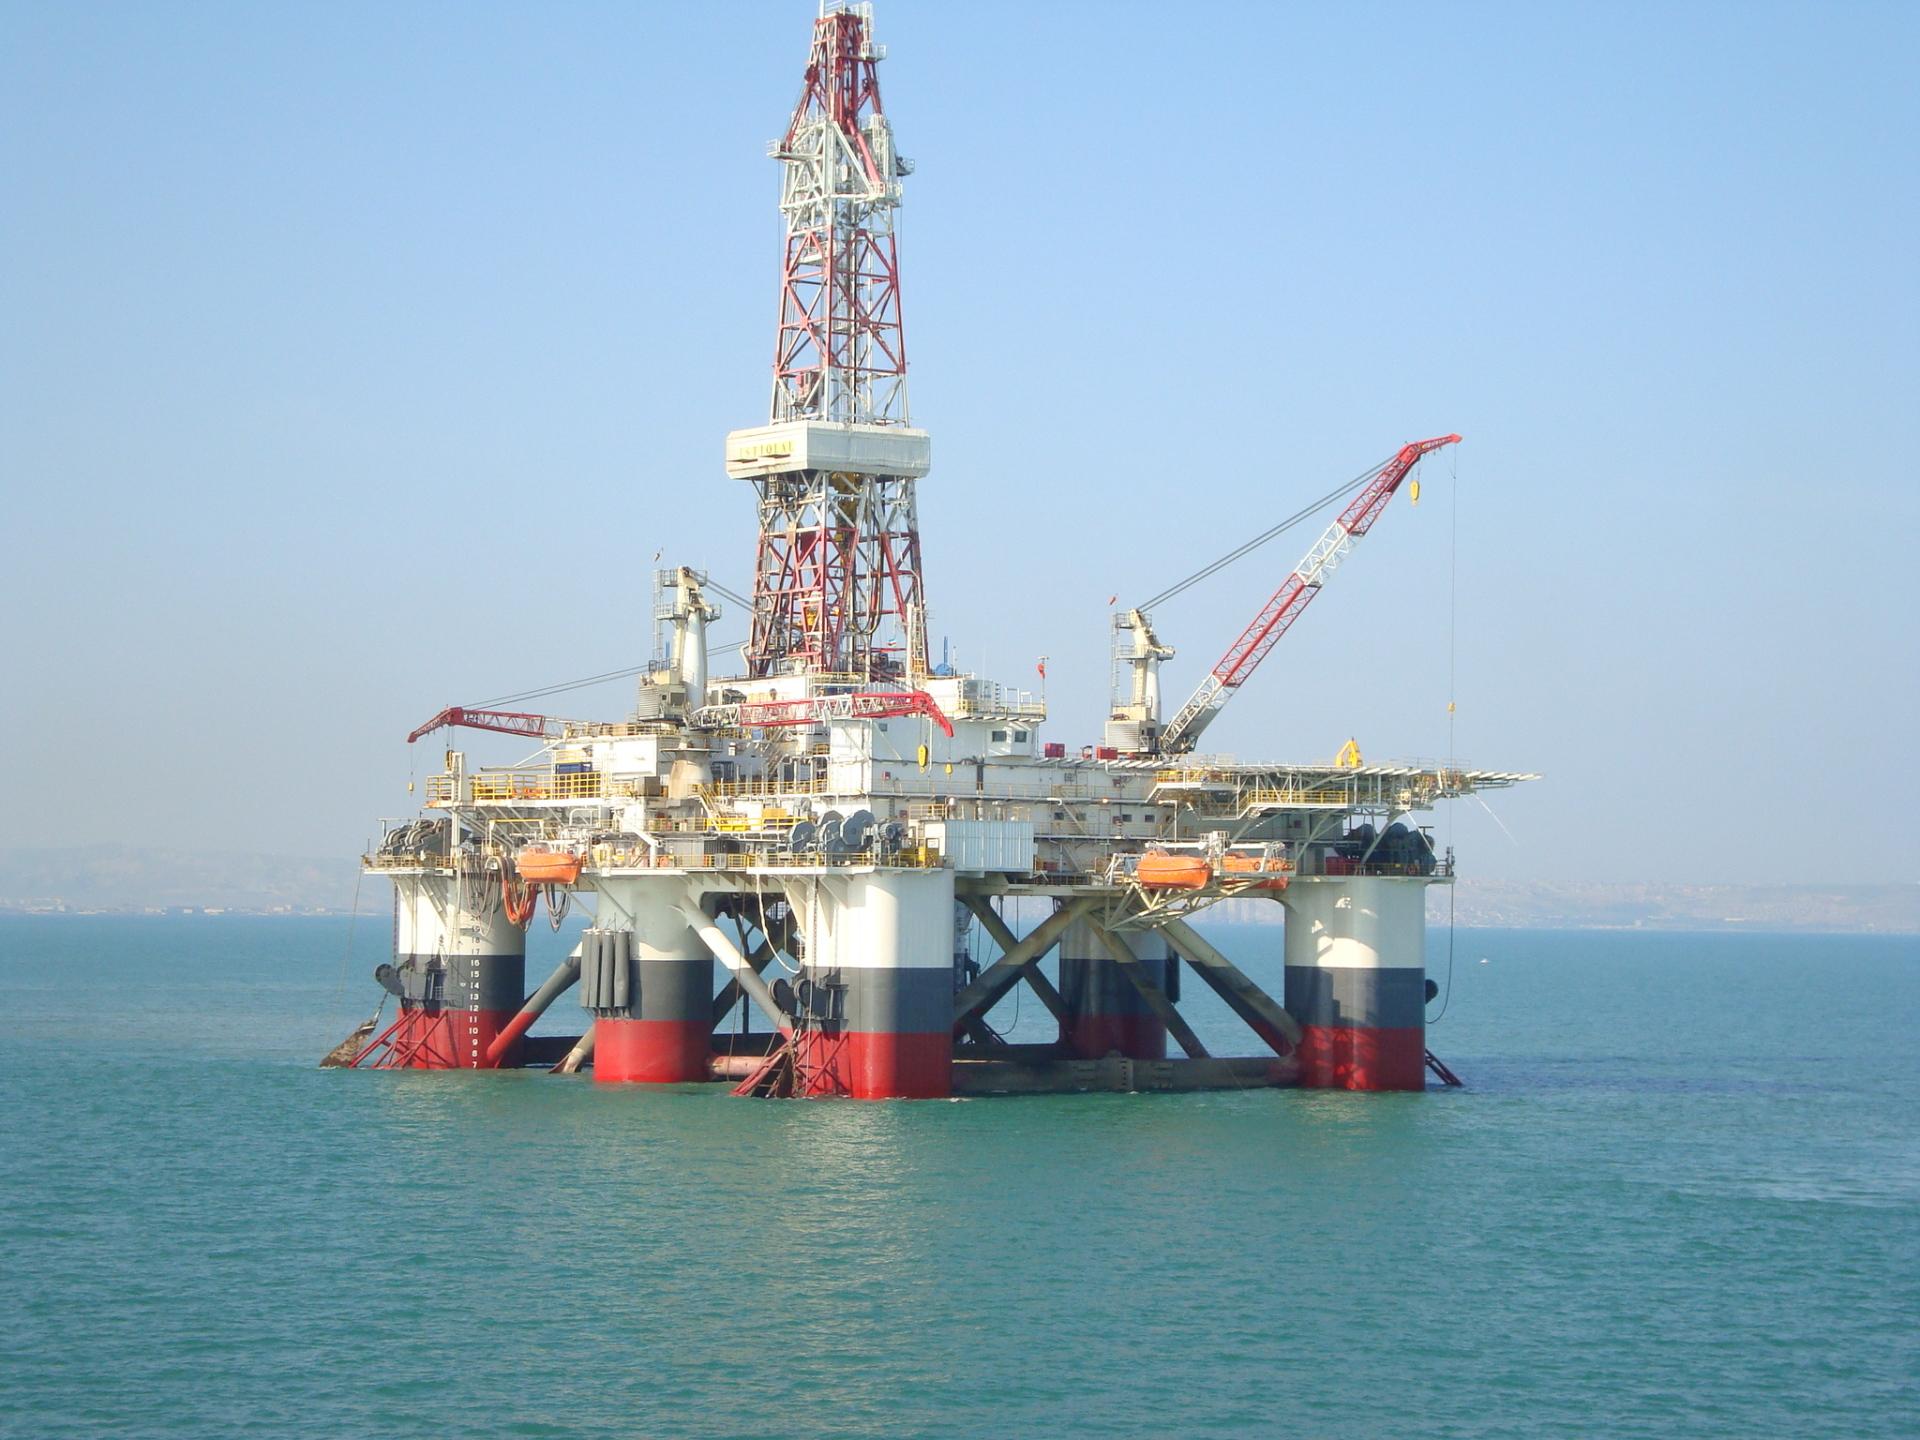 CASPIAN DRILLING, semi submersible drilling rig ISTIGLAL; Coral Shelf Explorer Series; semi submersible drilling rig DADA GORGUD; Friede Goldman Pacesetter series 9500